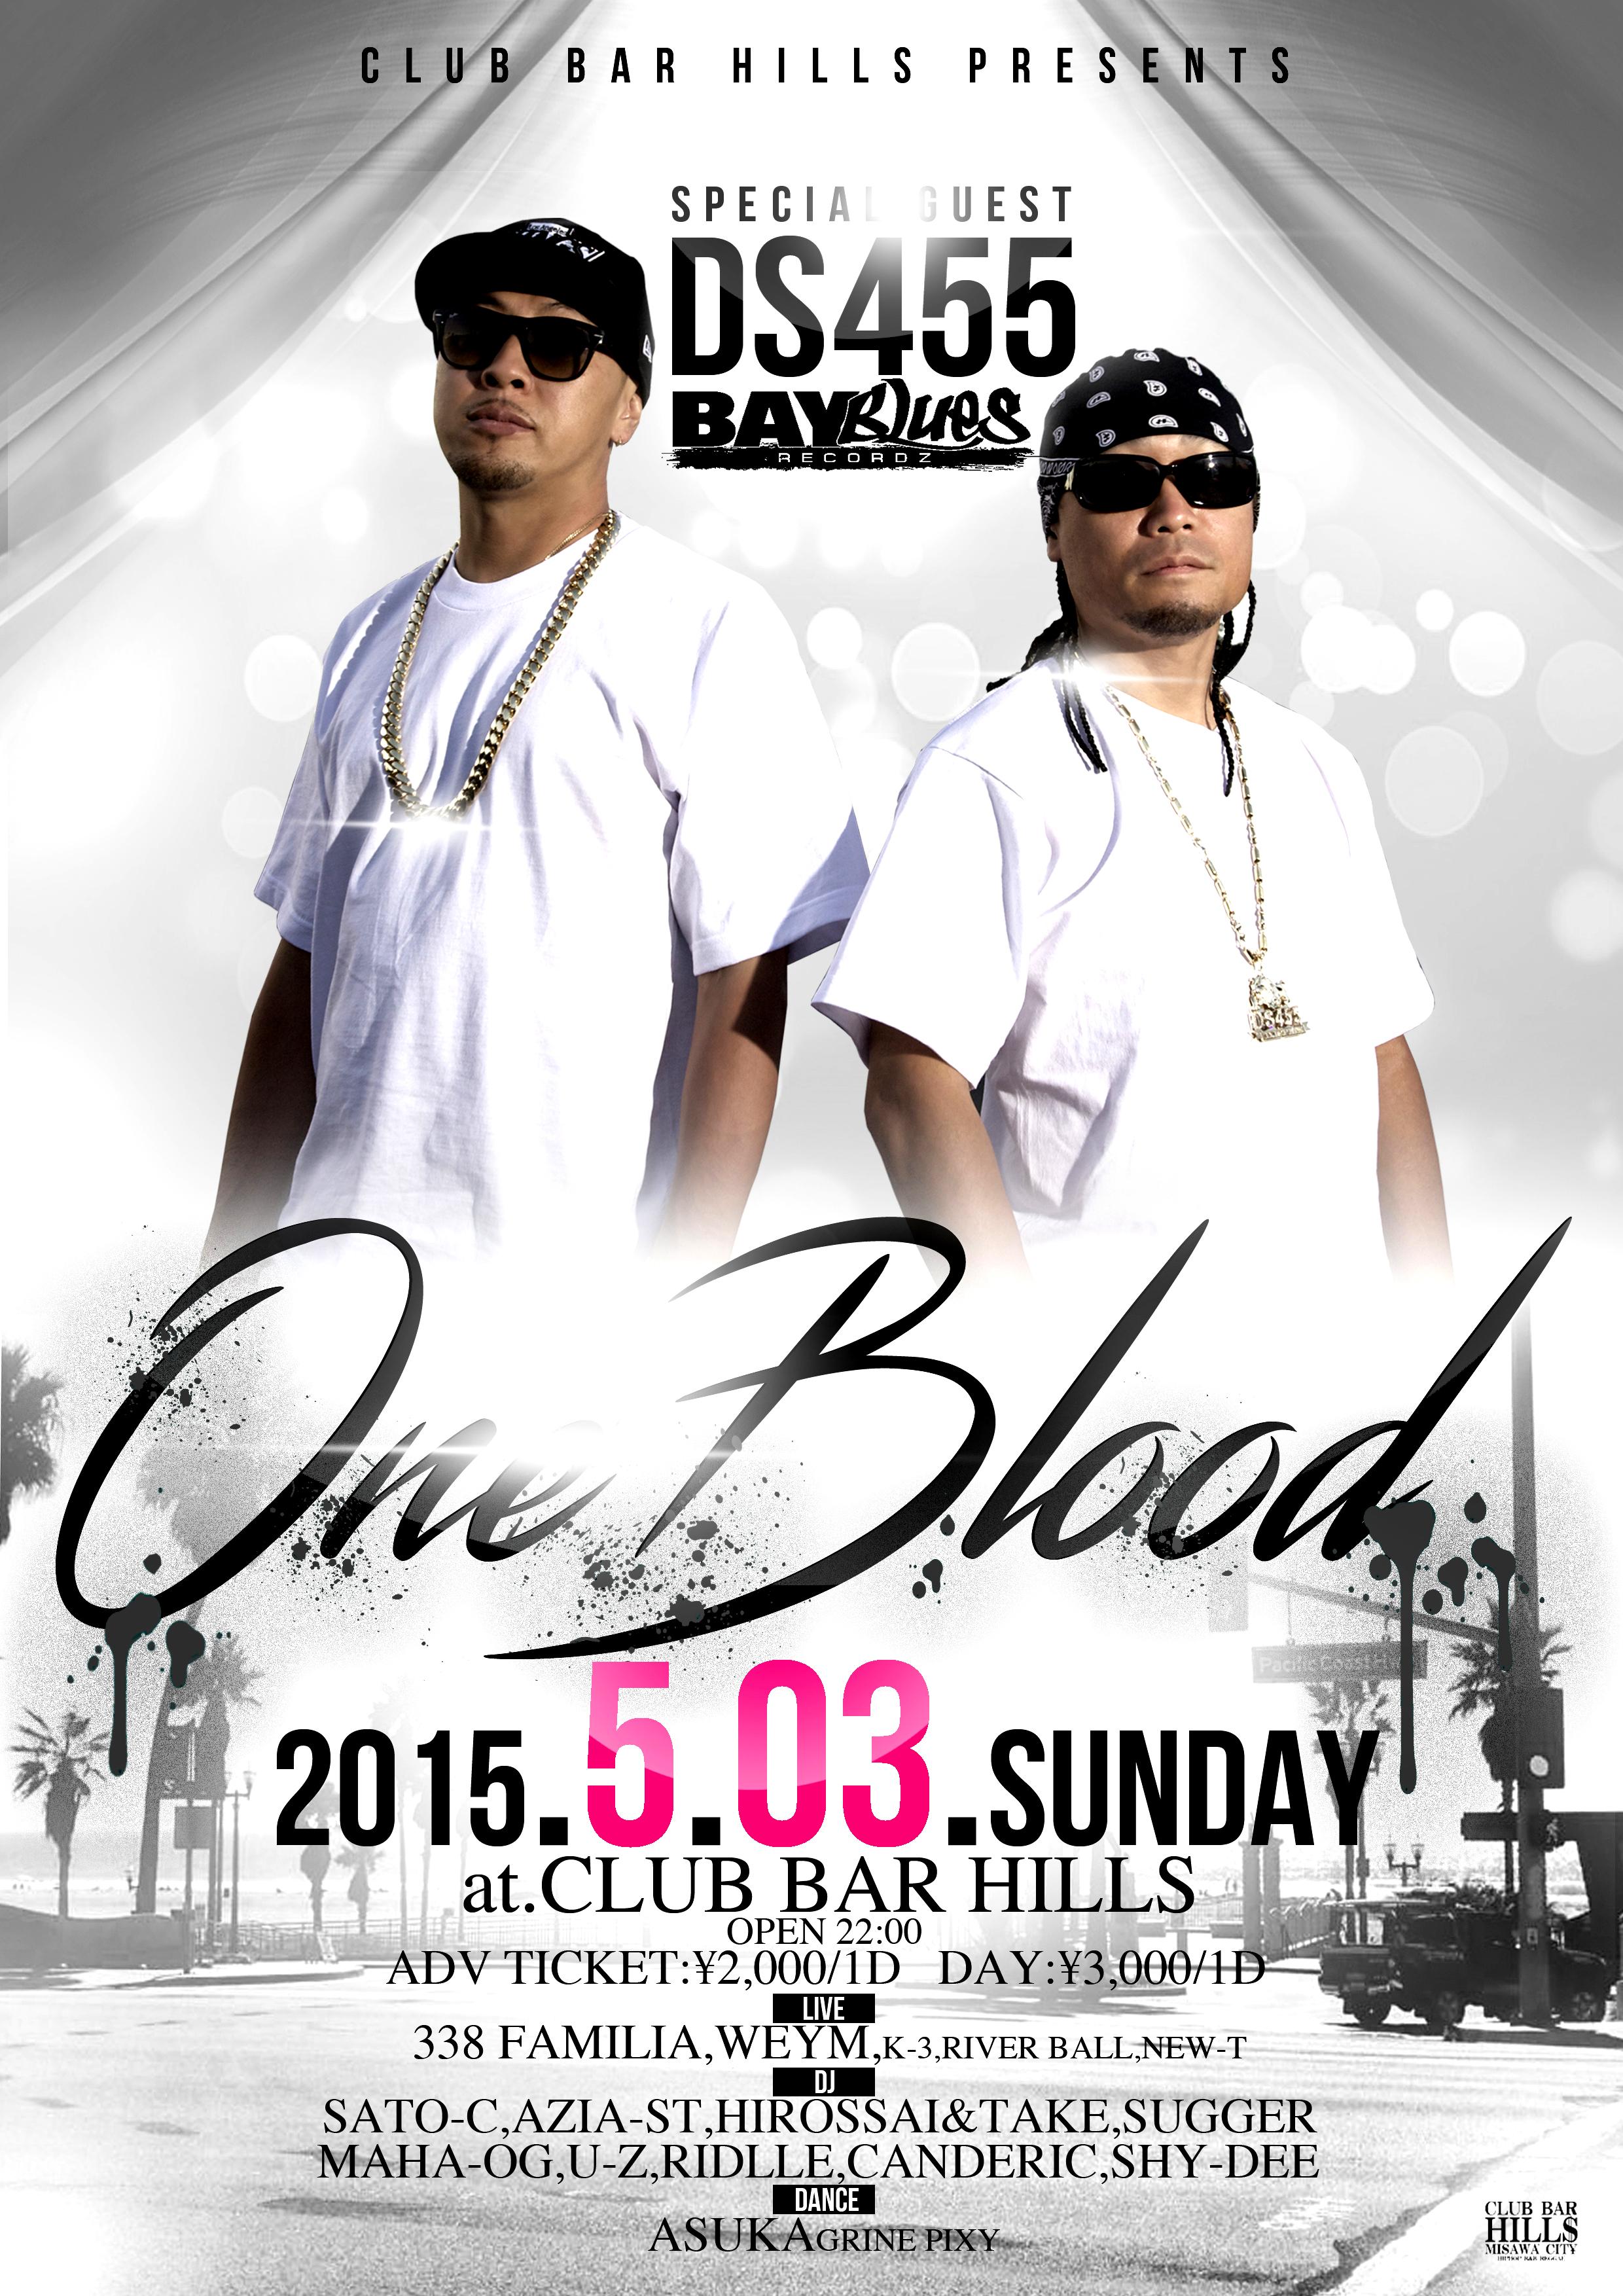 5月3日(日)「ONE BLOOD」@青森県三沢市 CLUB BAR HILLS